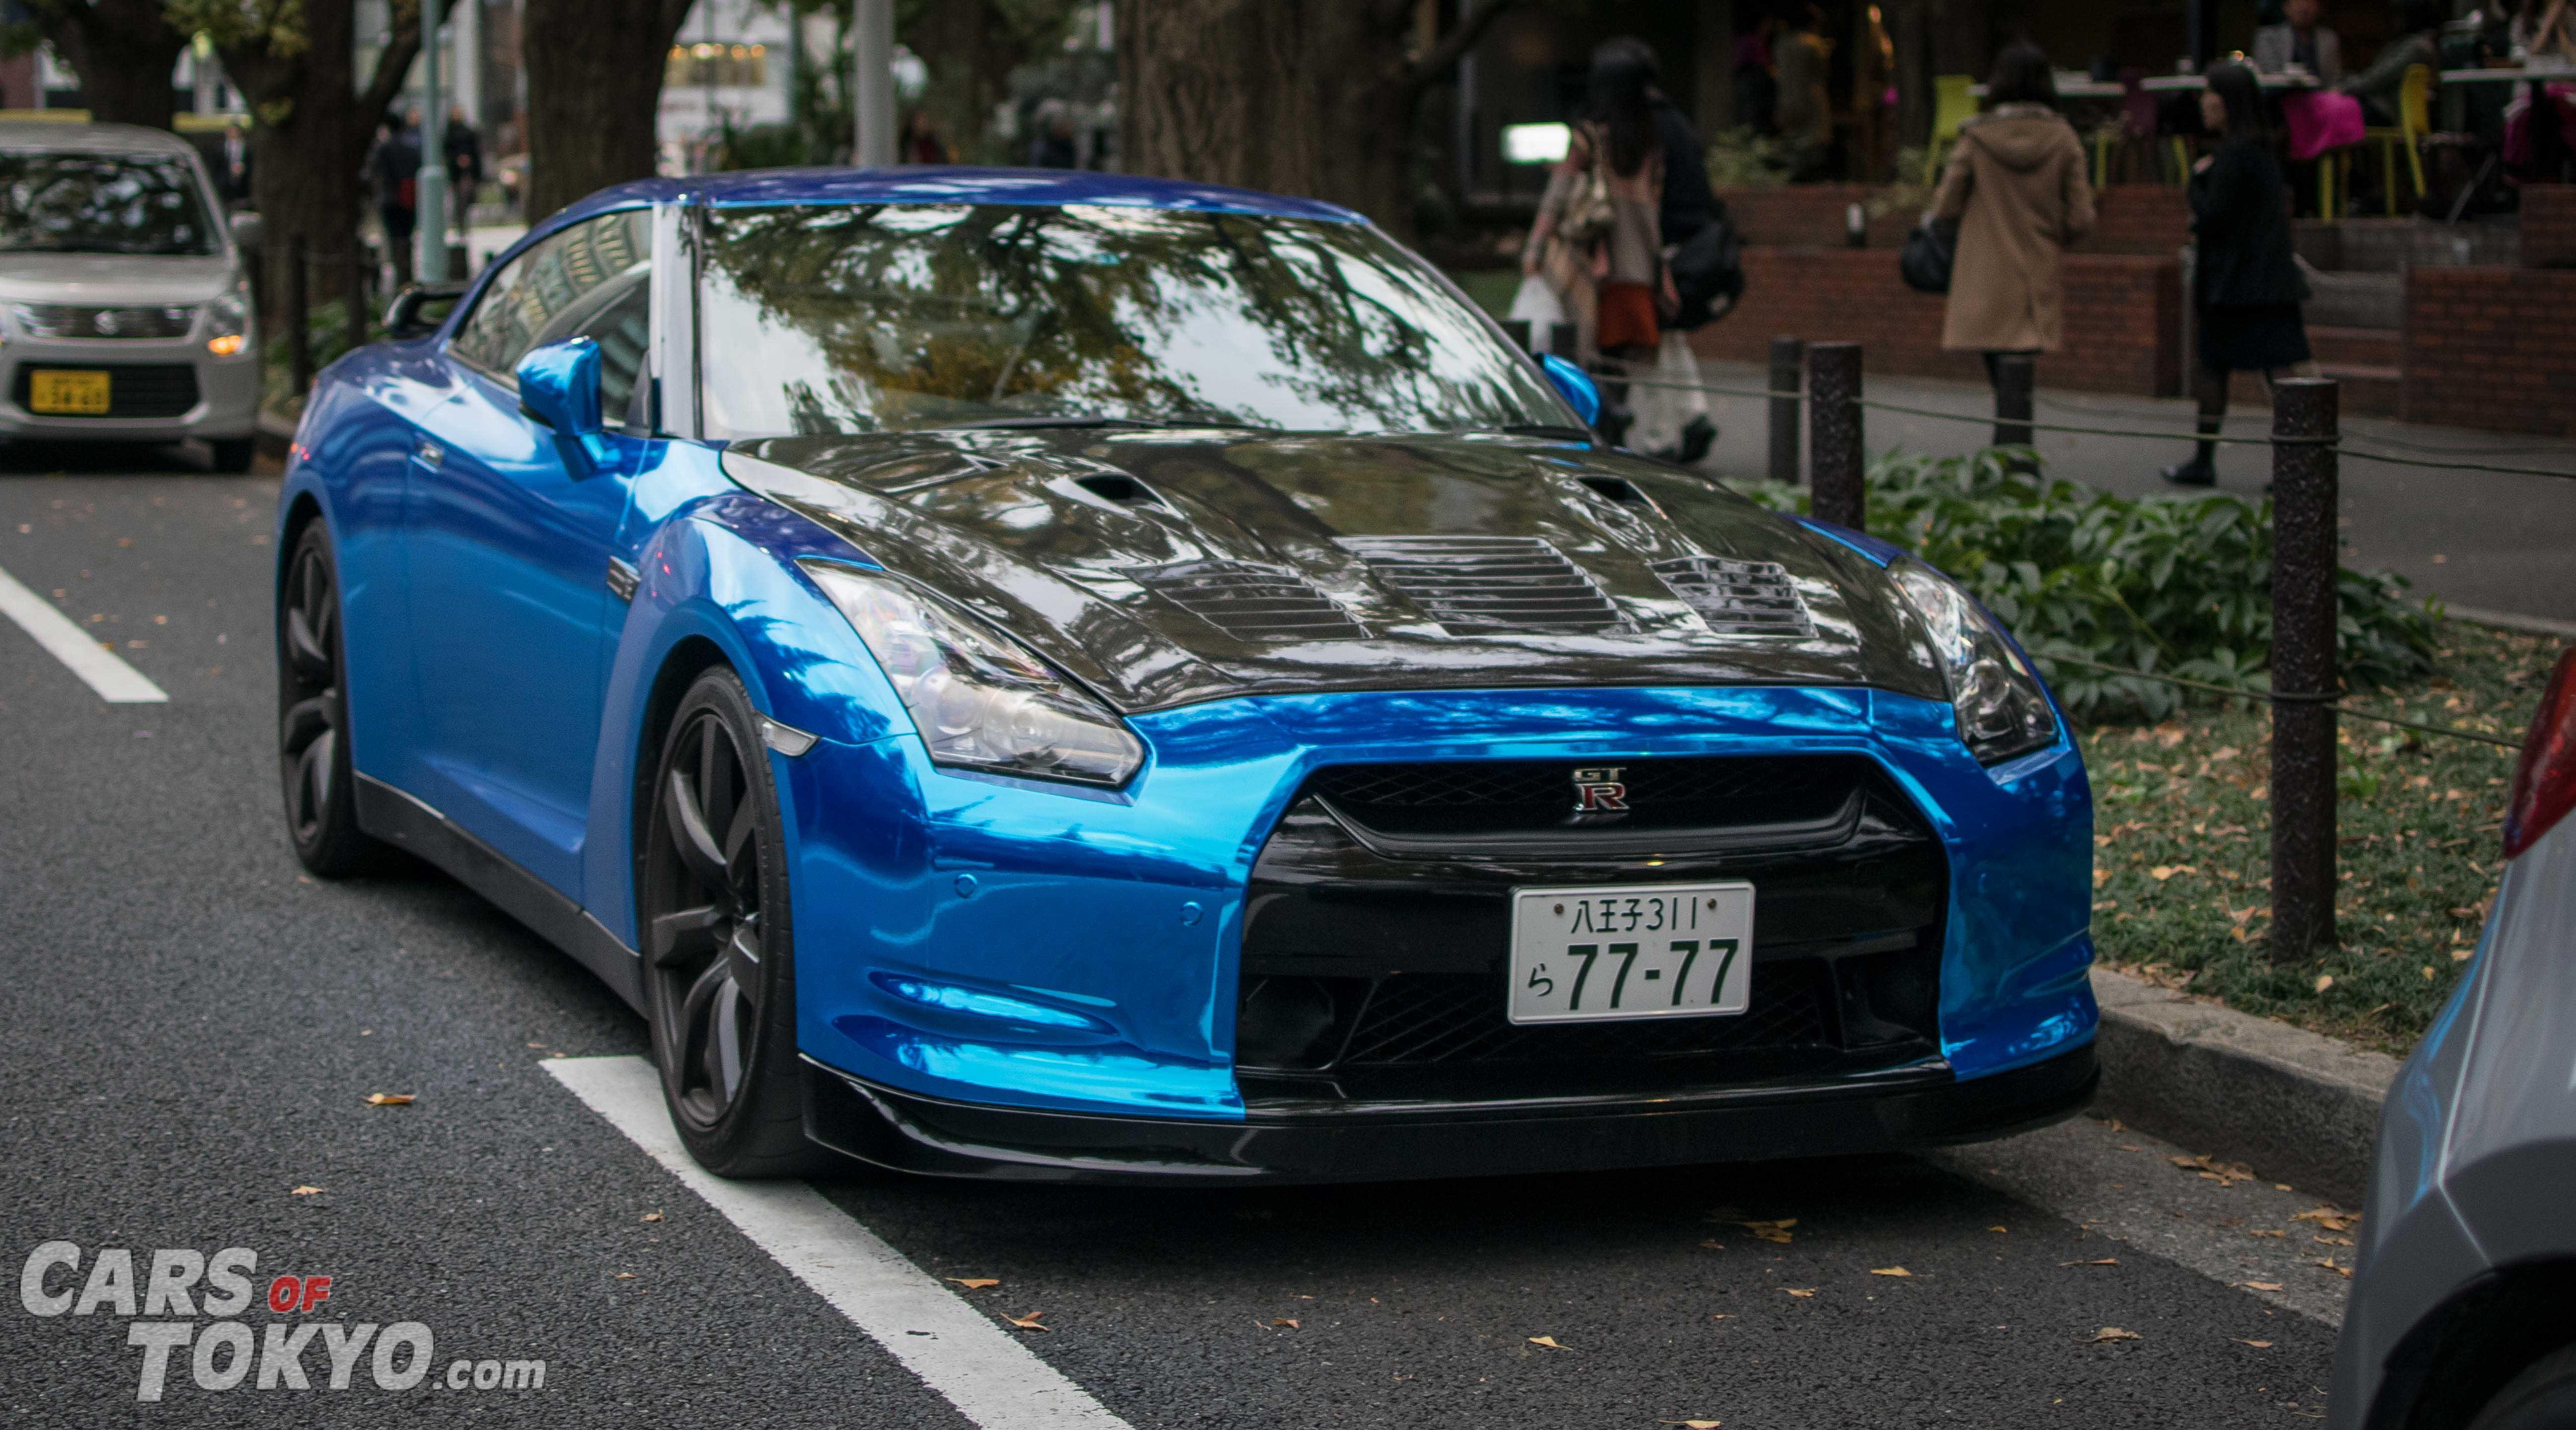 cars-of-tokyo-nissan-gtr-r35-blue-chrome